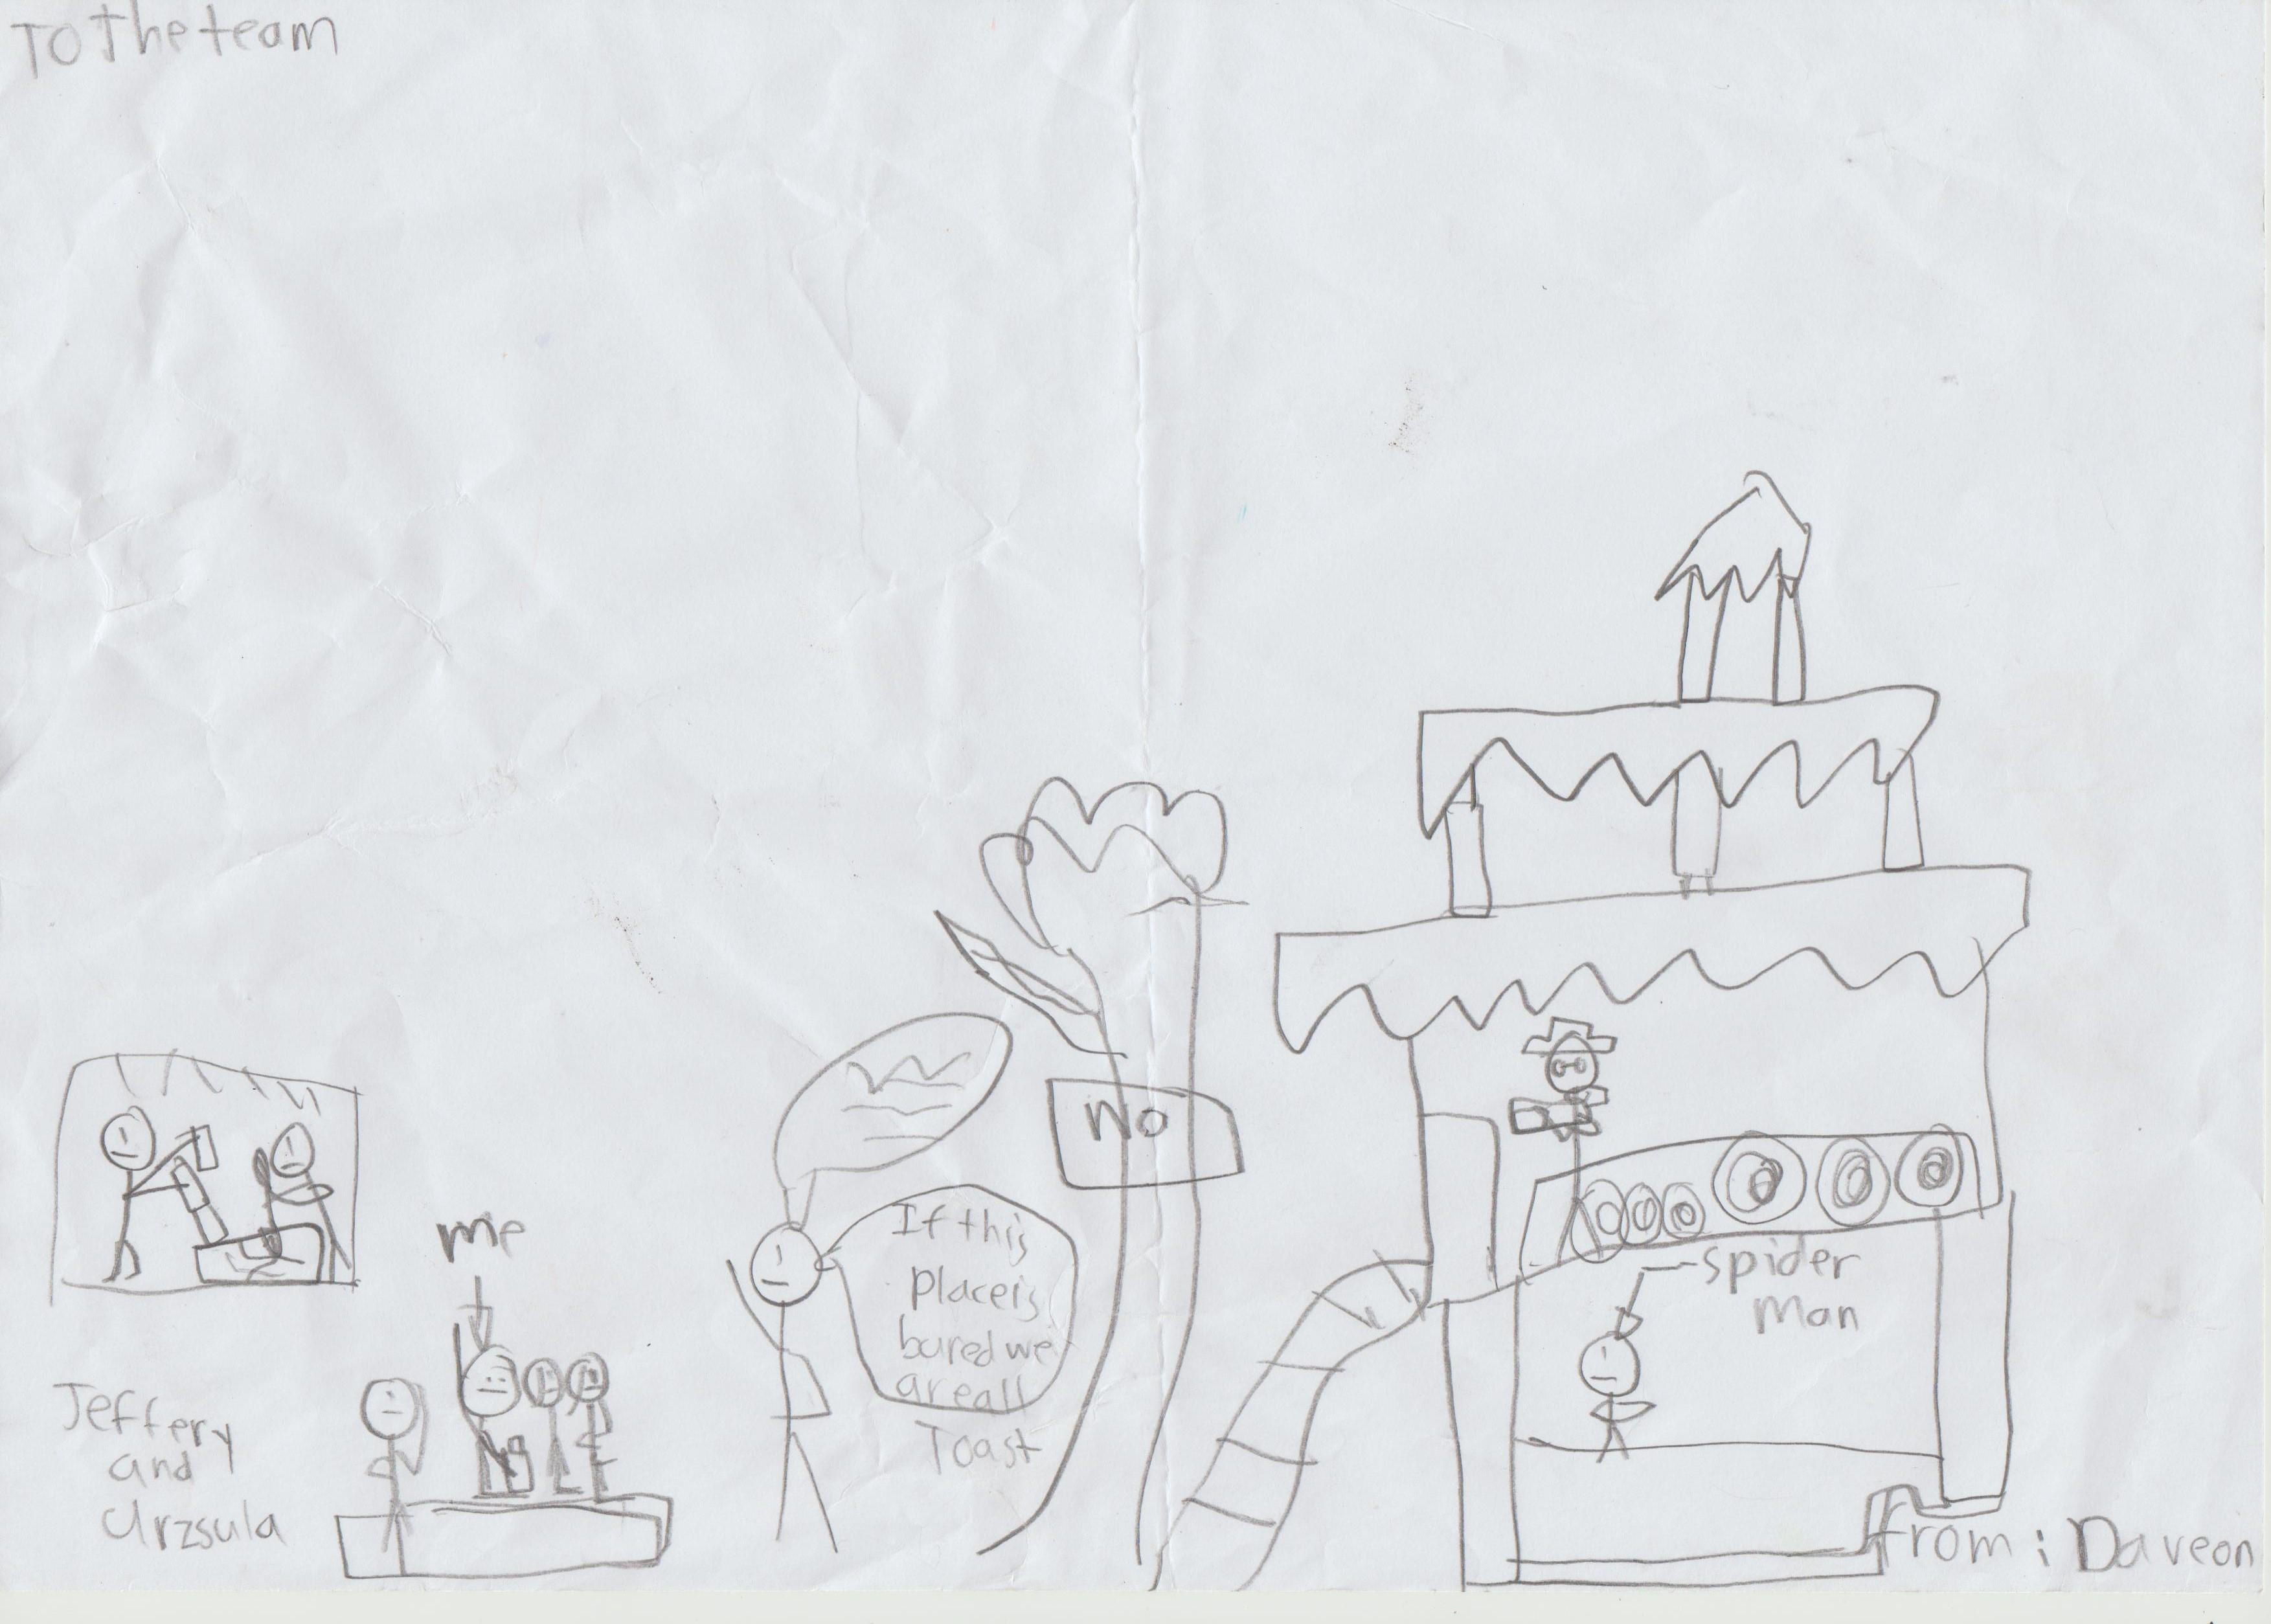 The school children's artwork illustrating their memories of the visit